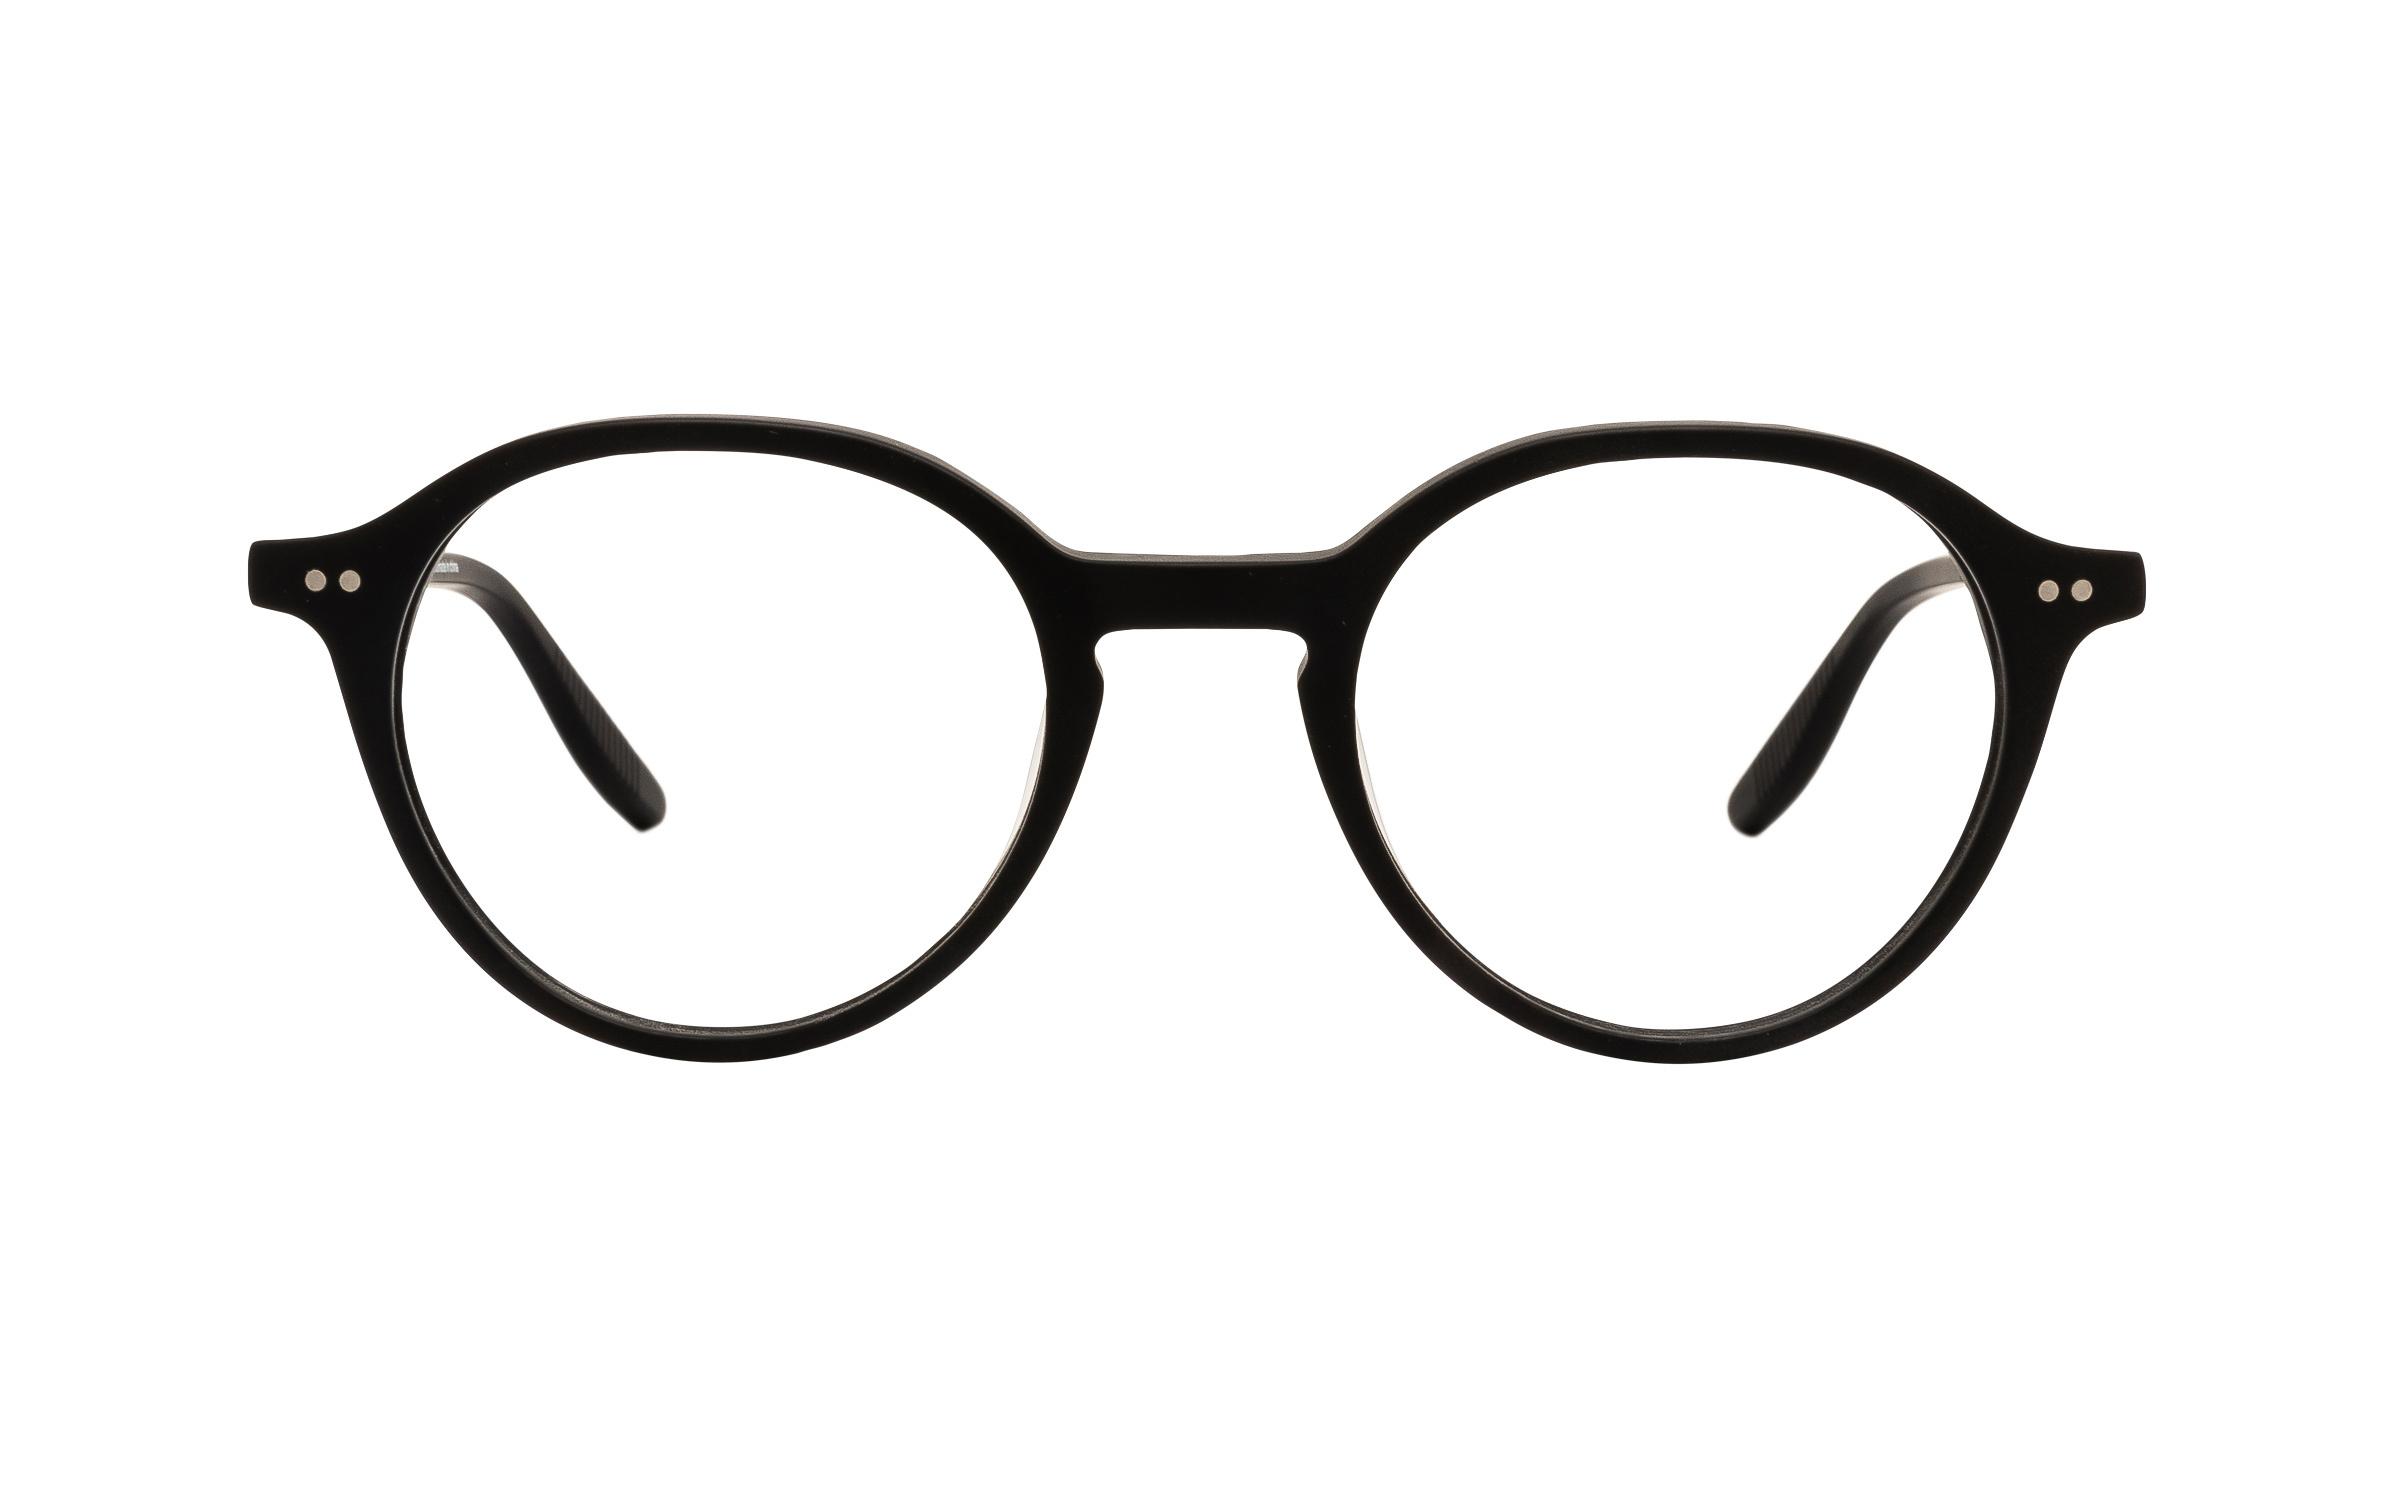 Joseph Marc Bonetta JM060 C01 (49) Eyeglasses and Frame in Matte Black | Acetate/Plastic/Metal - Online